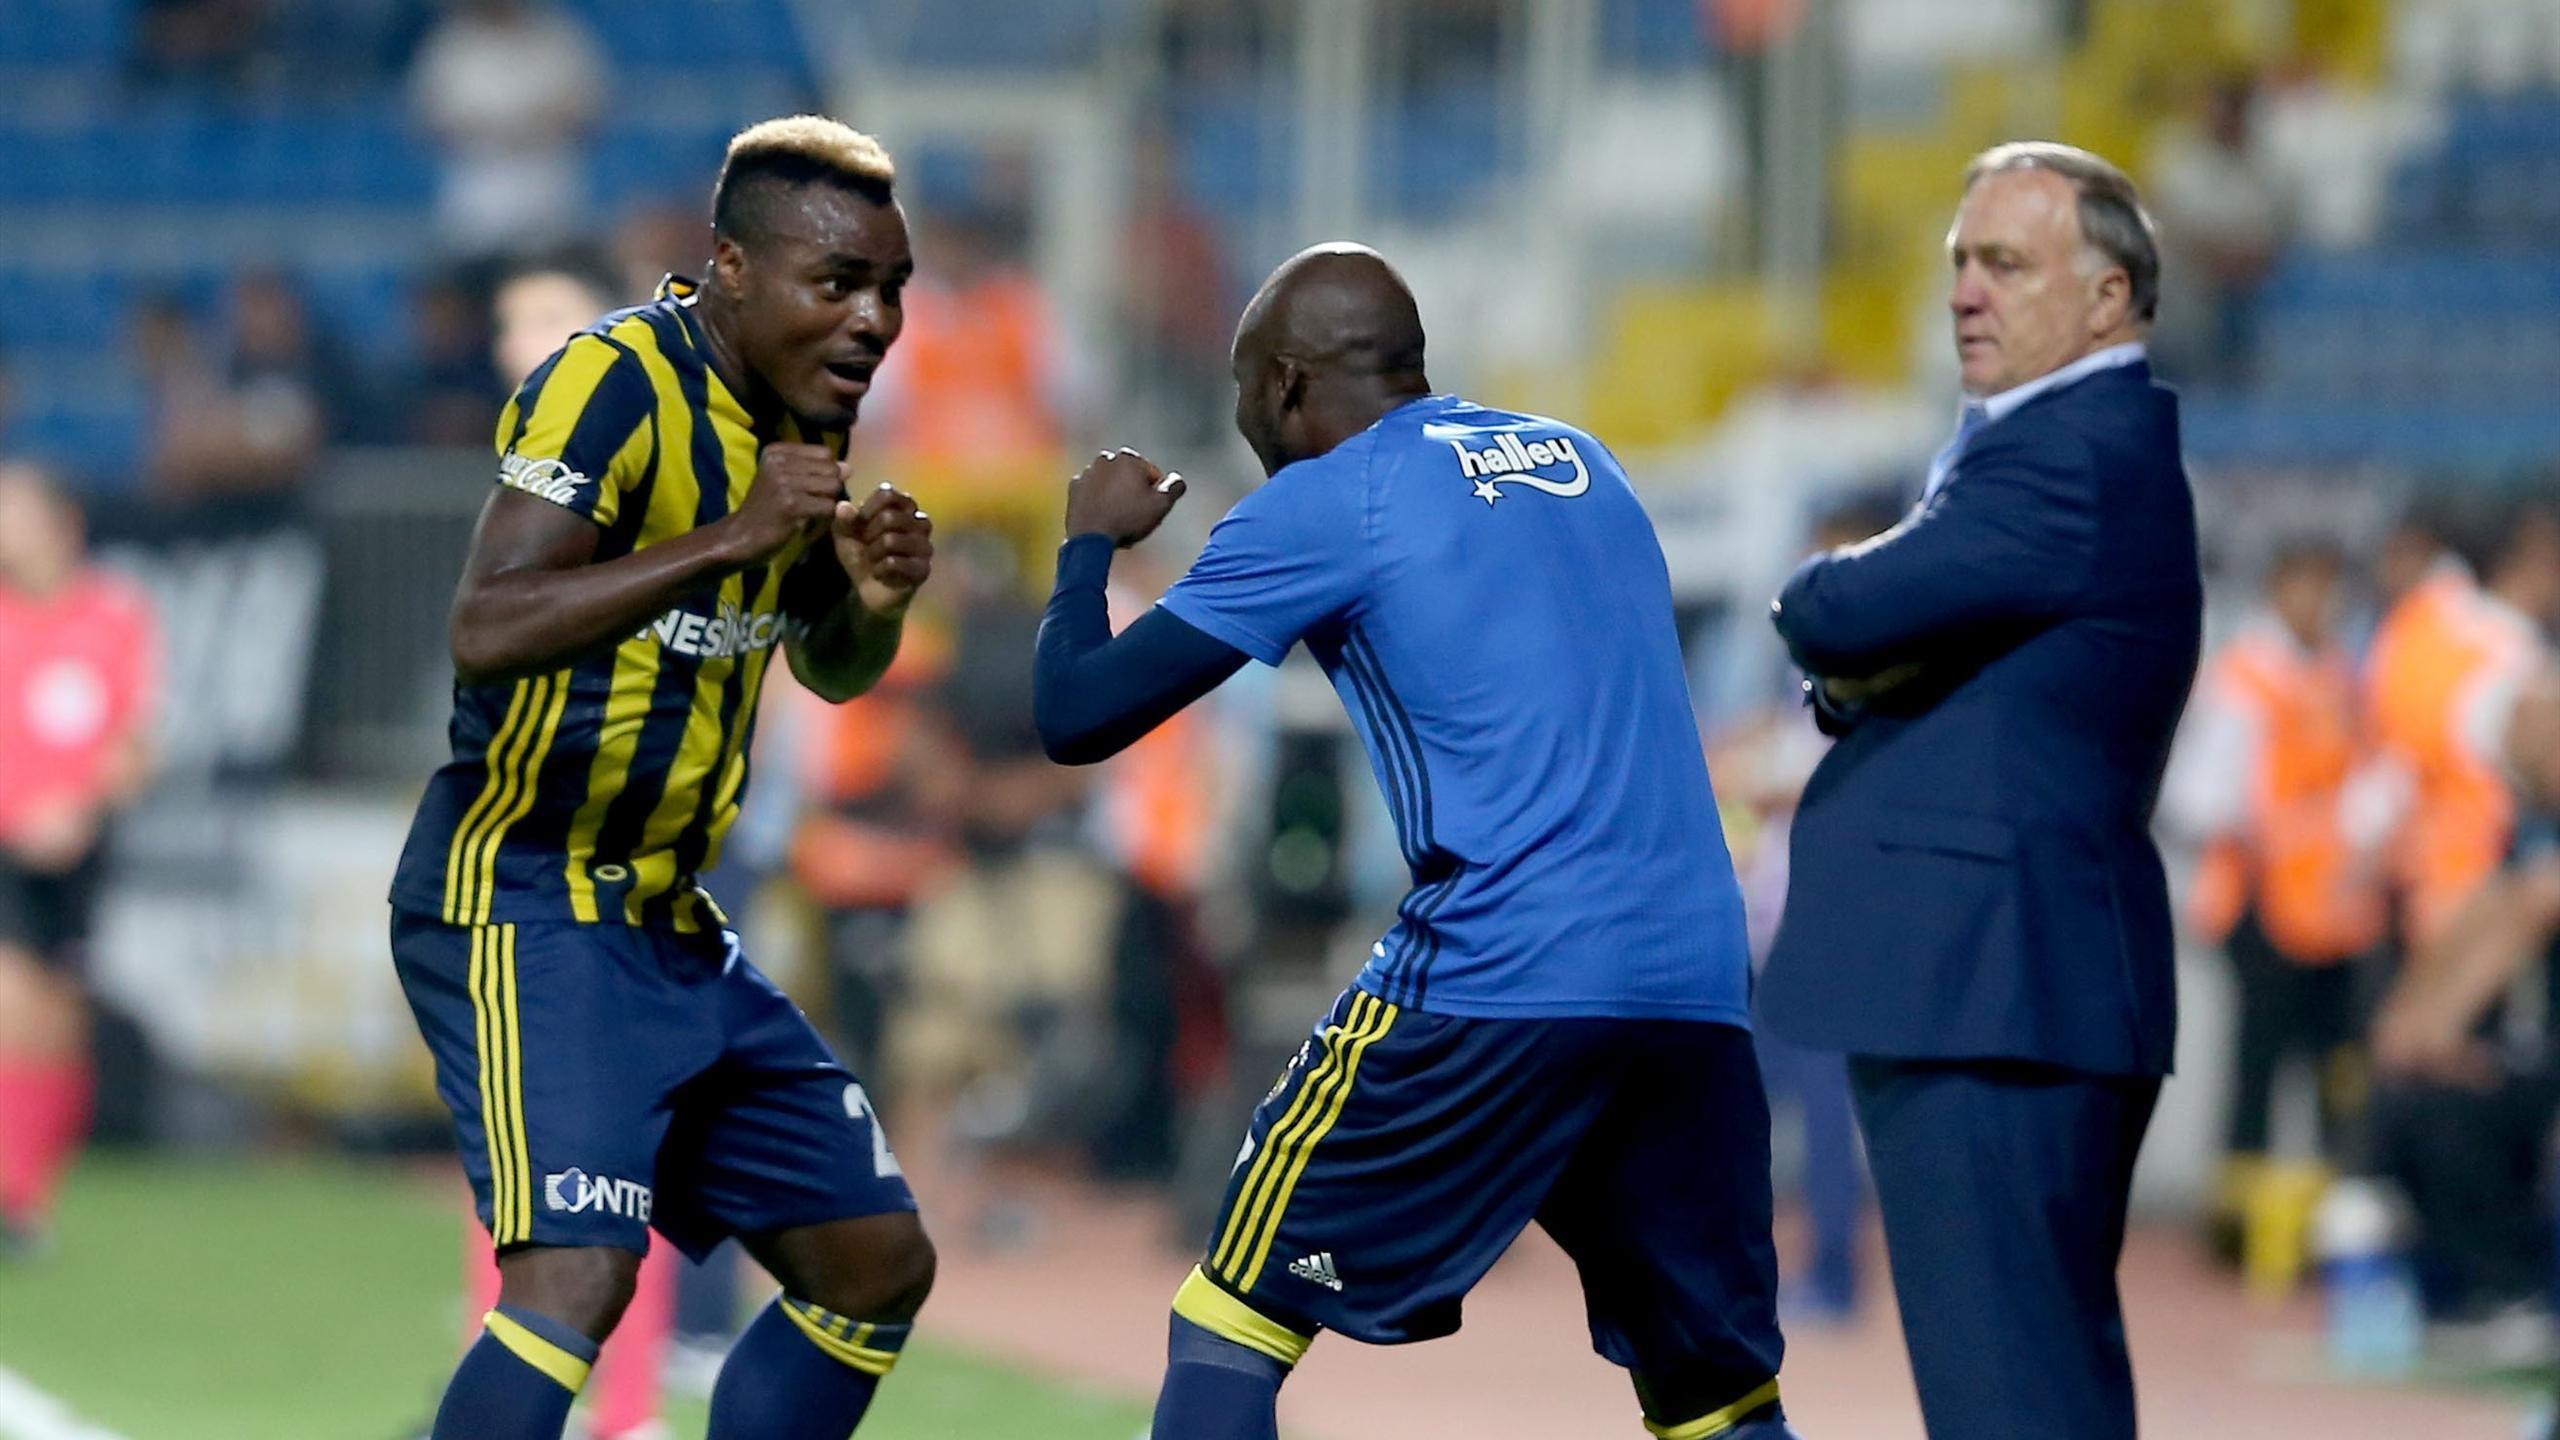 Kasımpaşa - Fenerbahçe (Emenike - Sow)